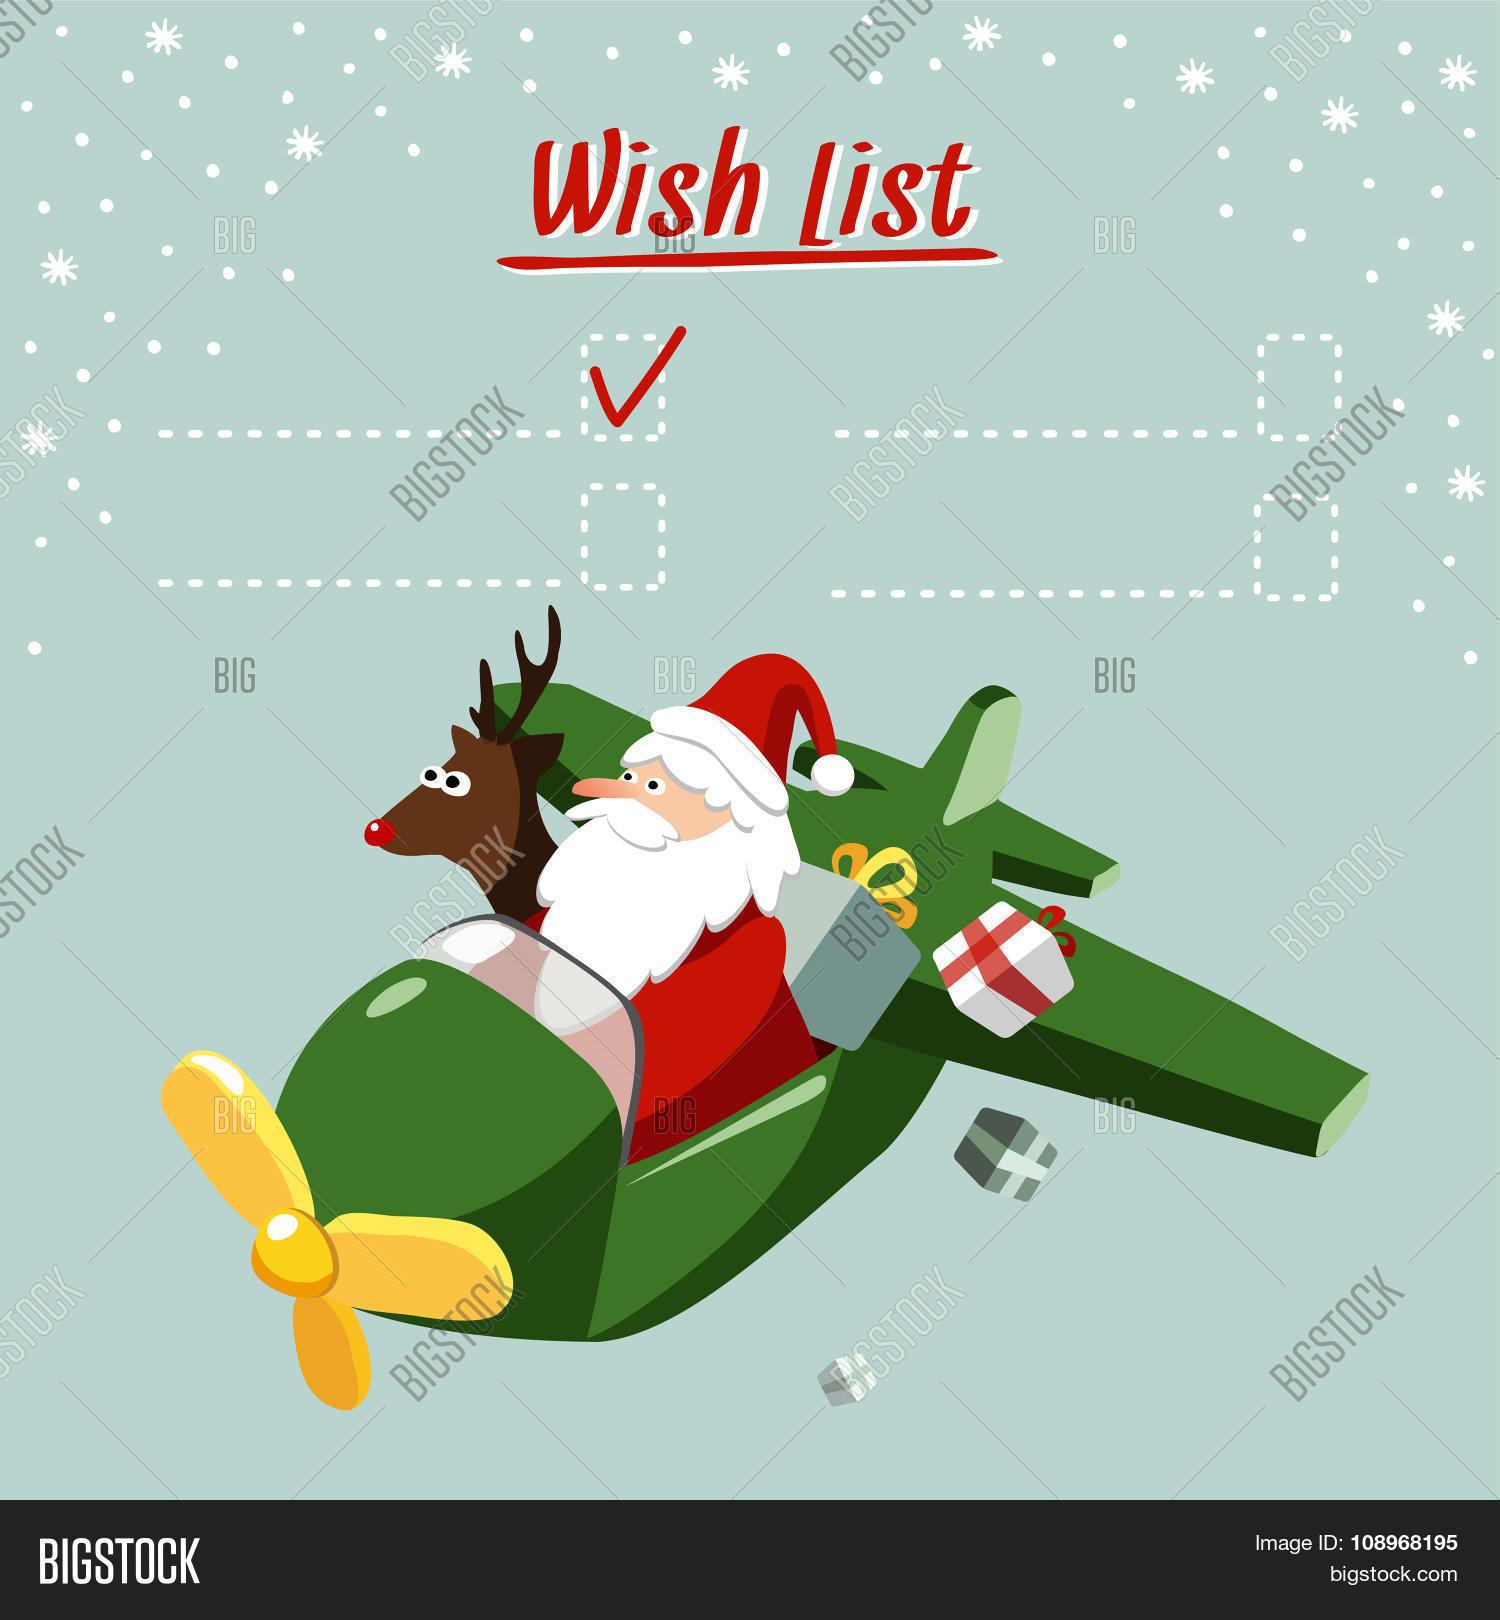 Cute Christmas Card, Wish List Vector & Photo | Bigstock